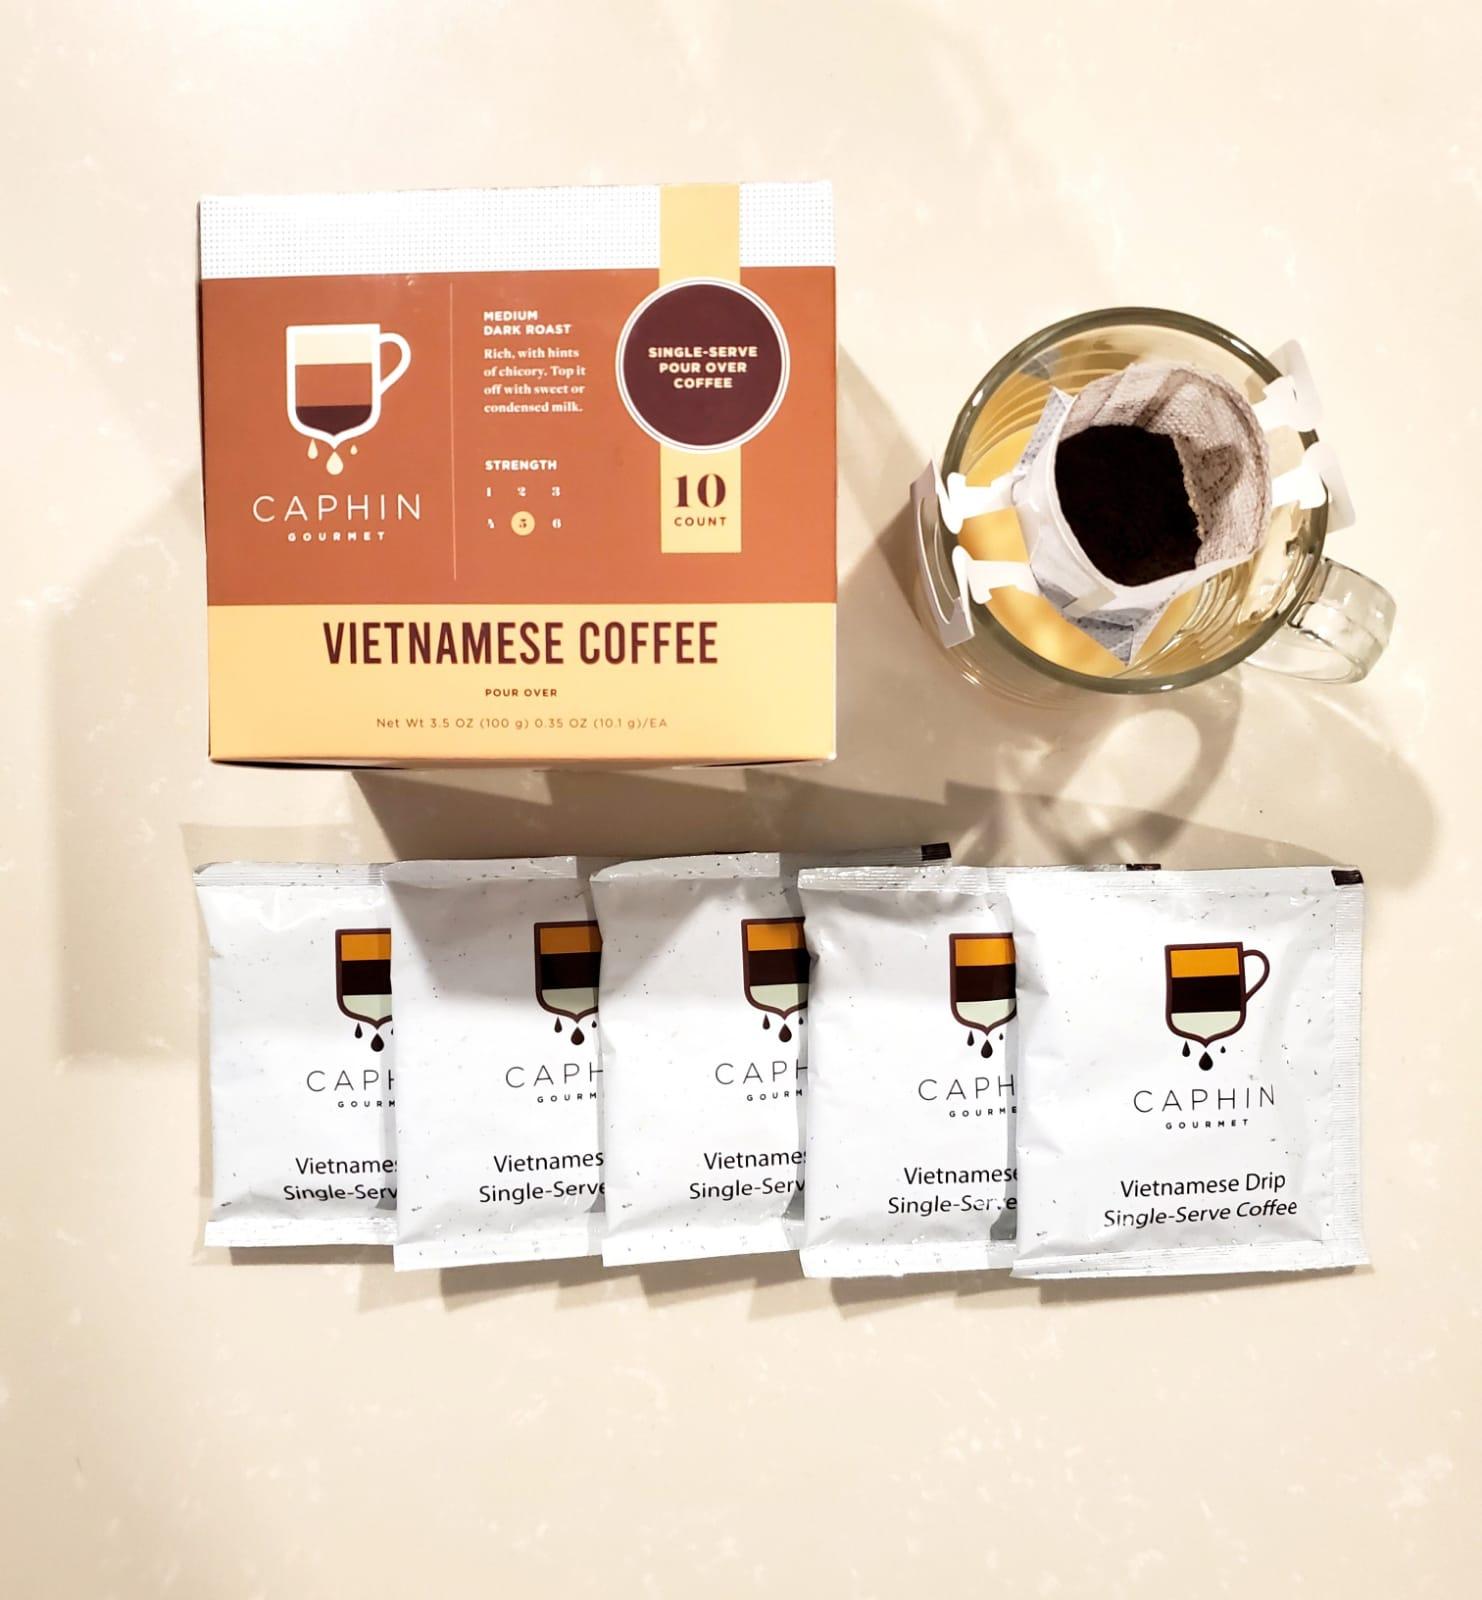 Caphin Vietnamese Coffee